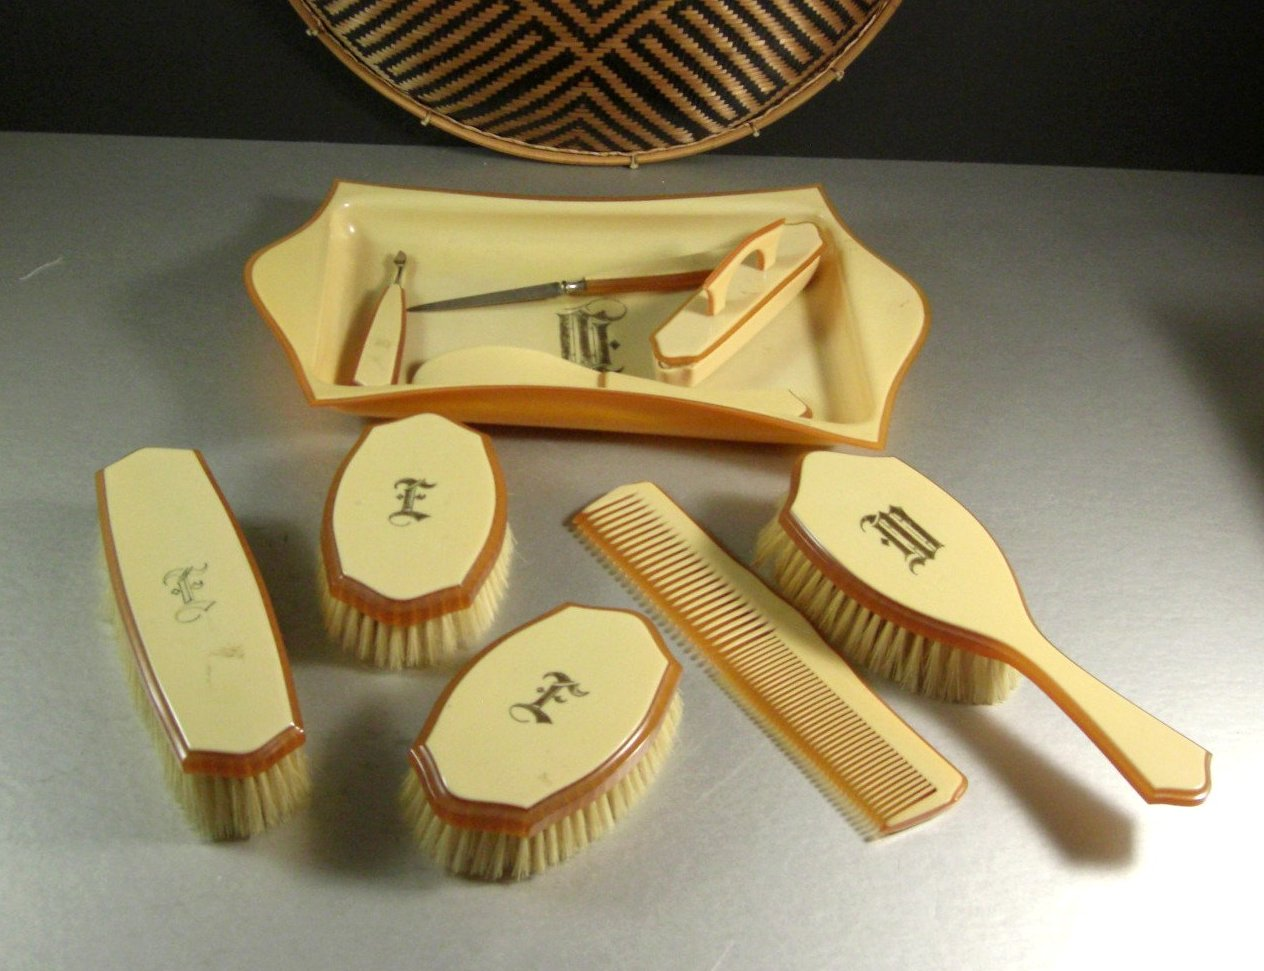 Anitque Vintage Gentlemen's Vanity Set / Monogrammed / Ivory Tone